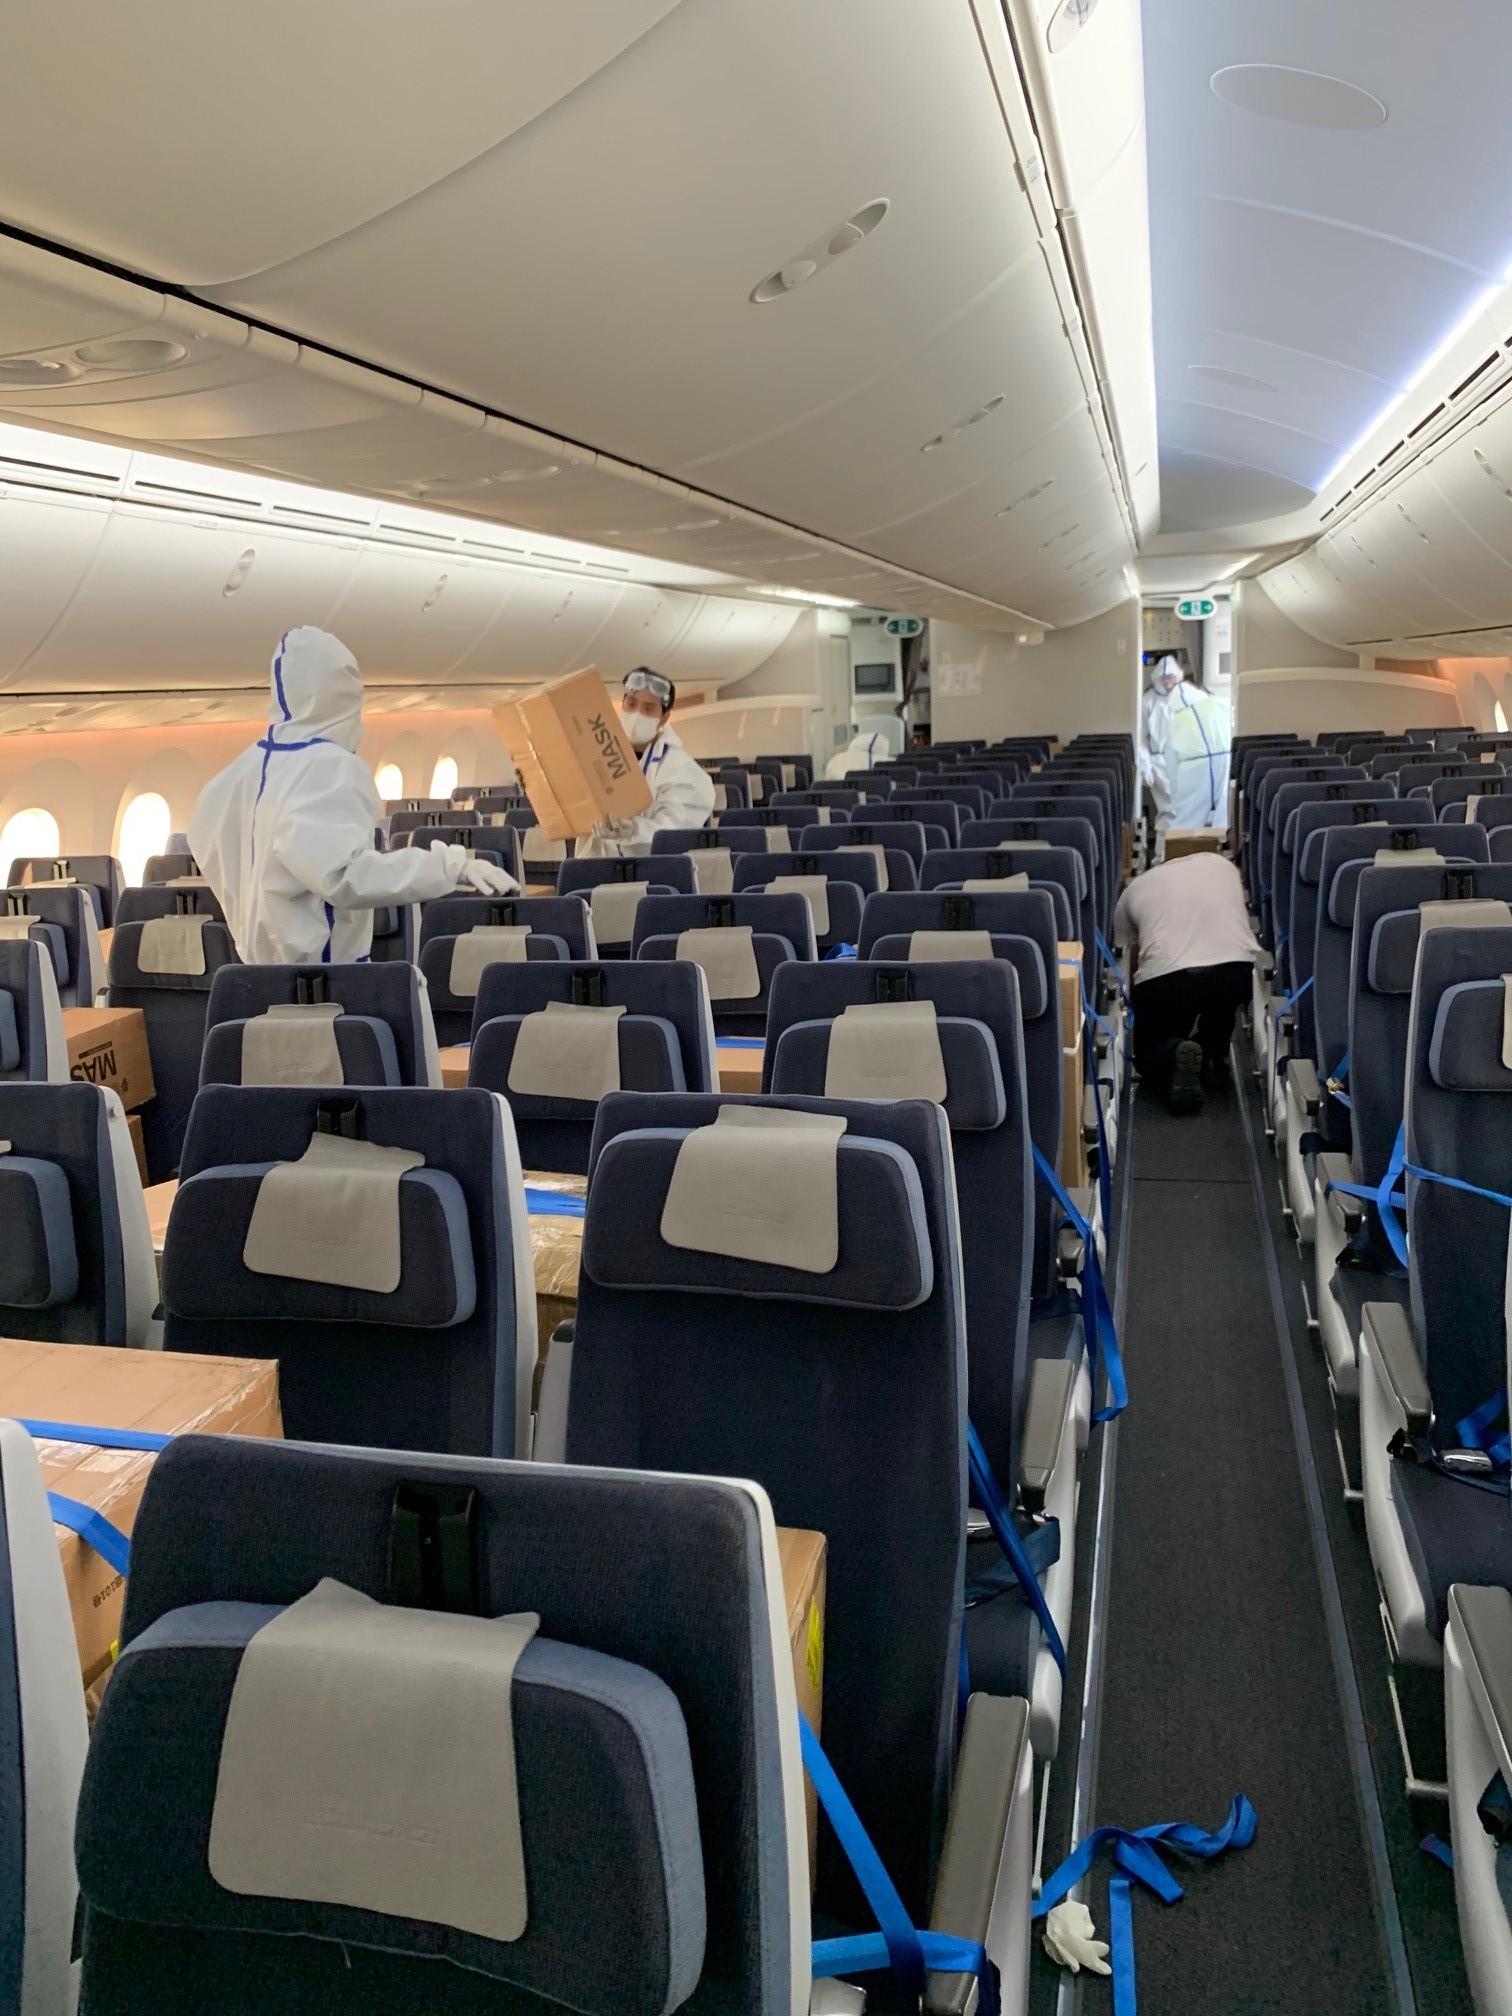 European Cockpit Association Eca: A Passenger Aircraft Without Passengers